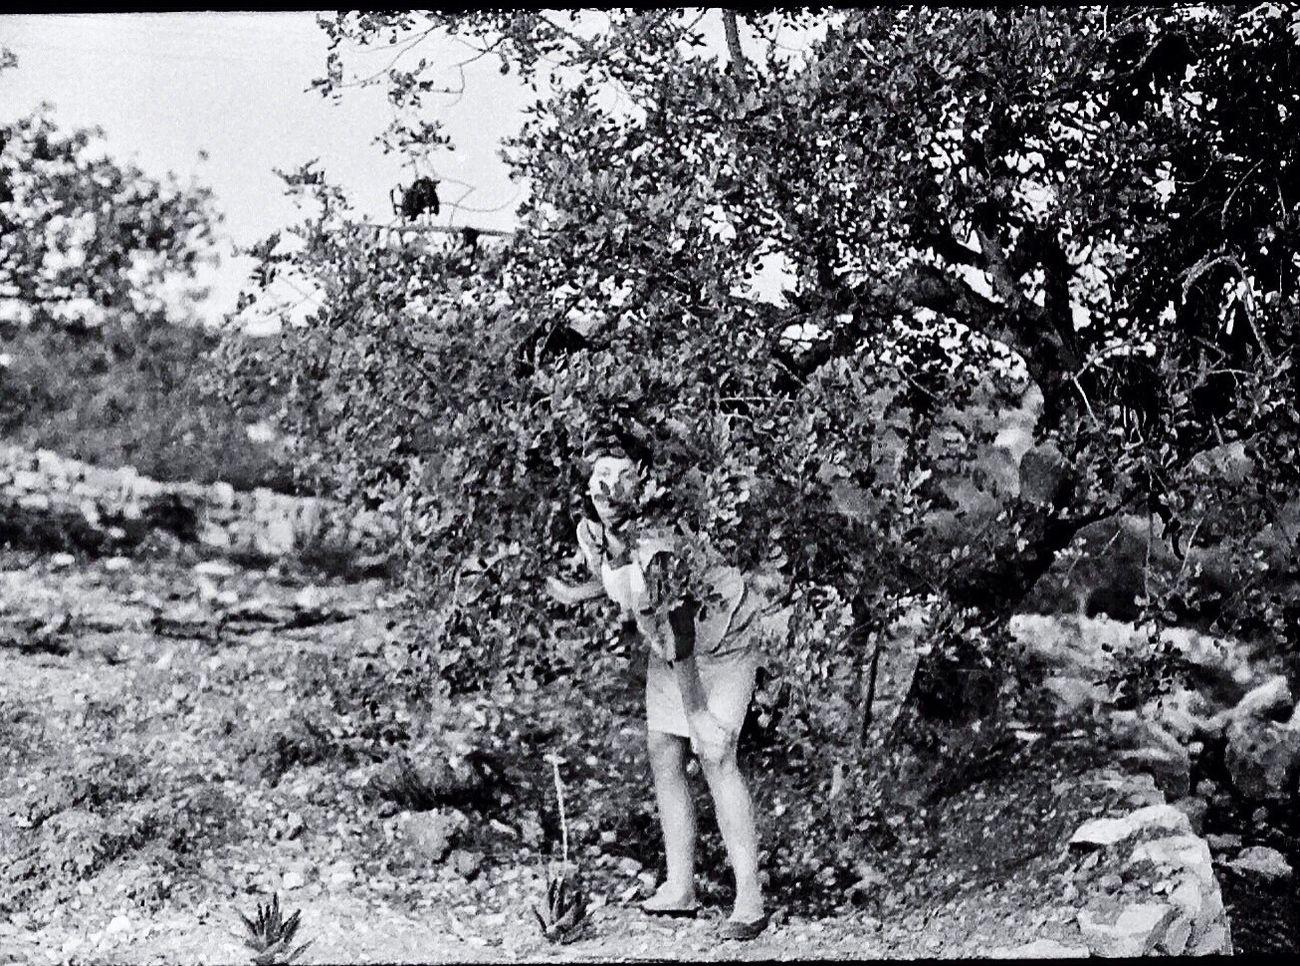 Tree Nature Blk N Wht Portugal Nikon FE Koduckgirl